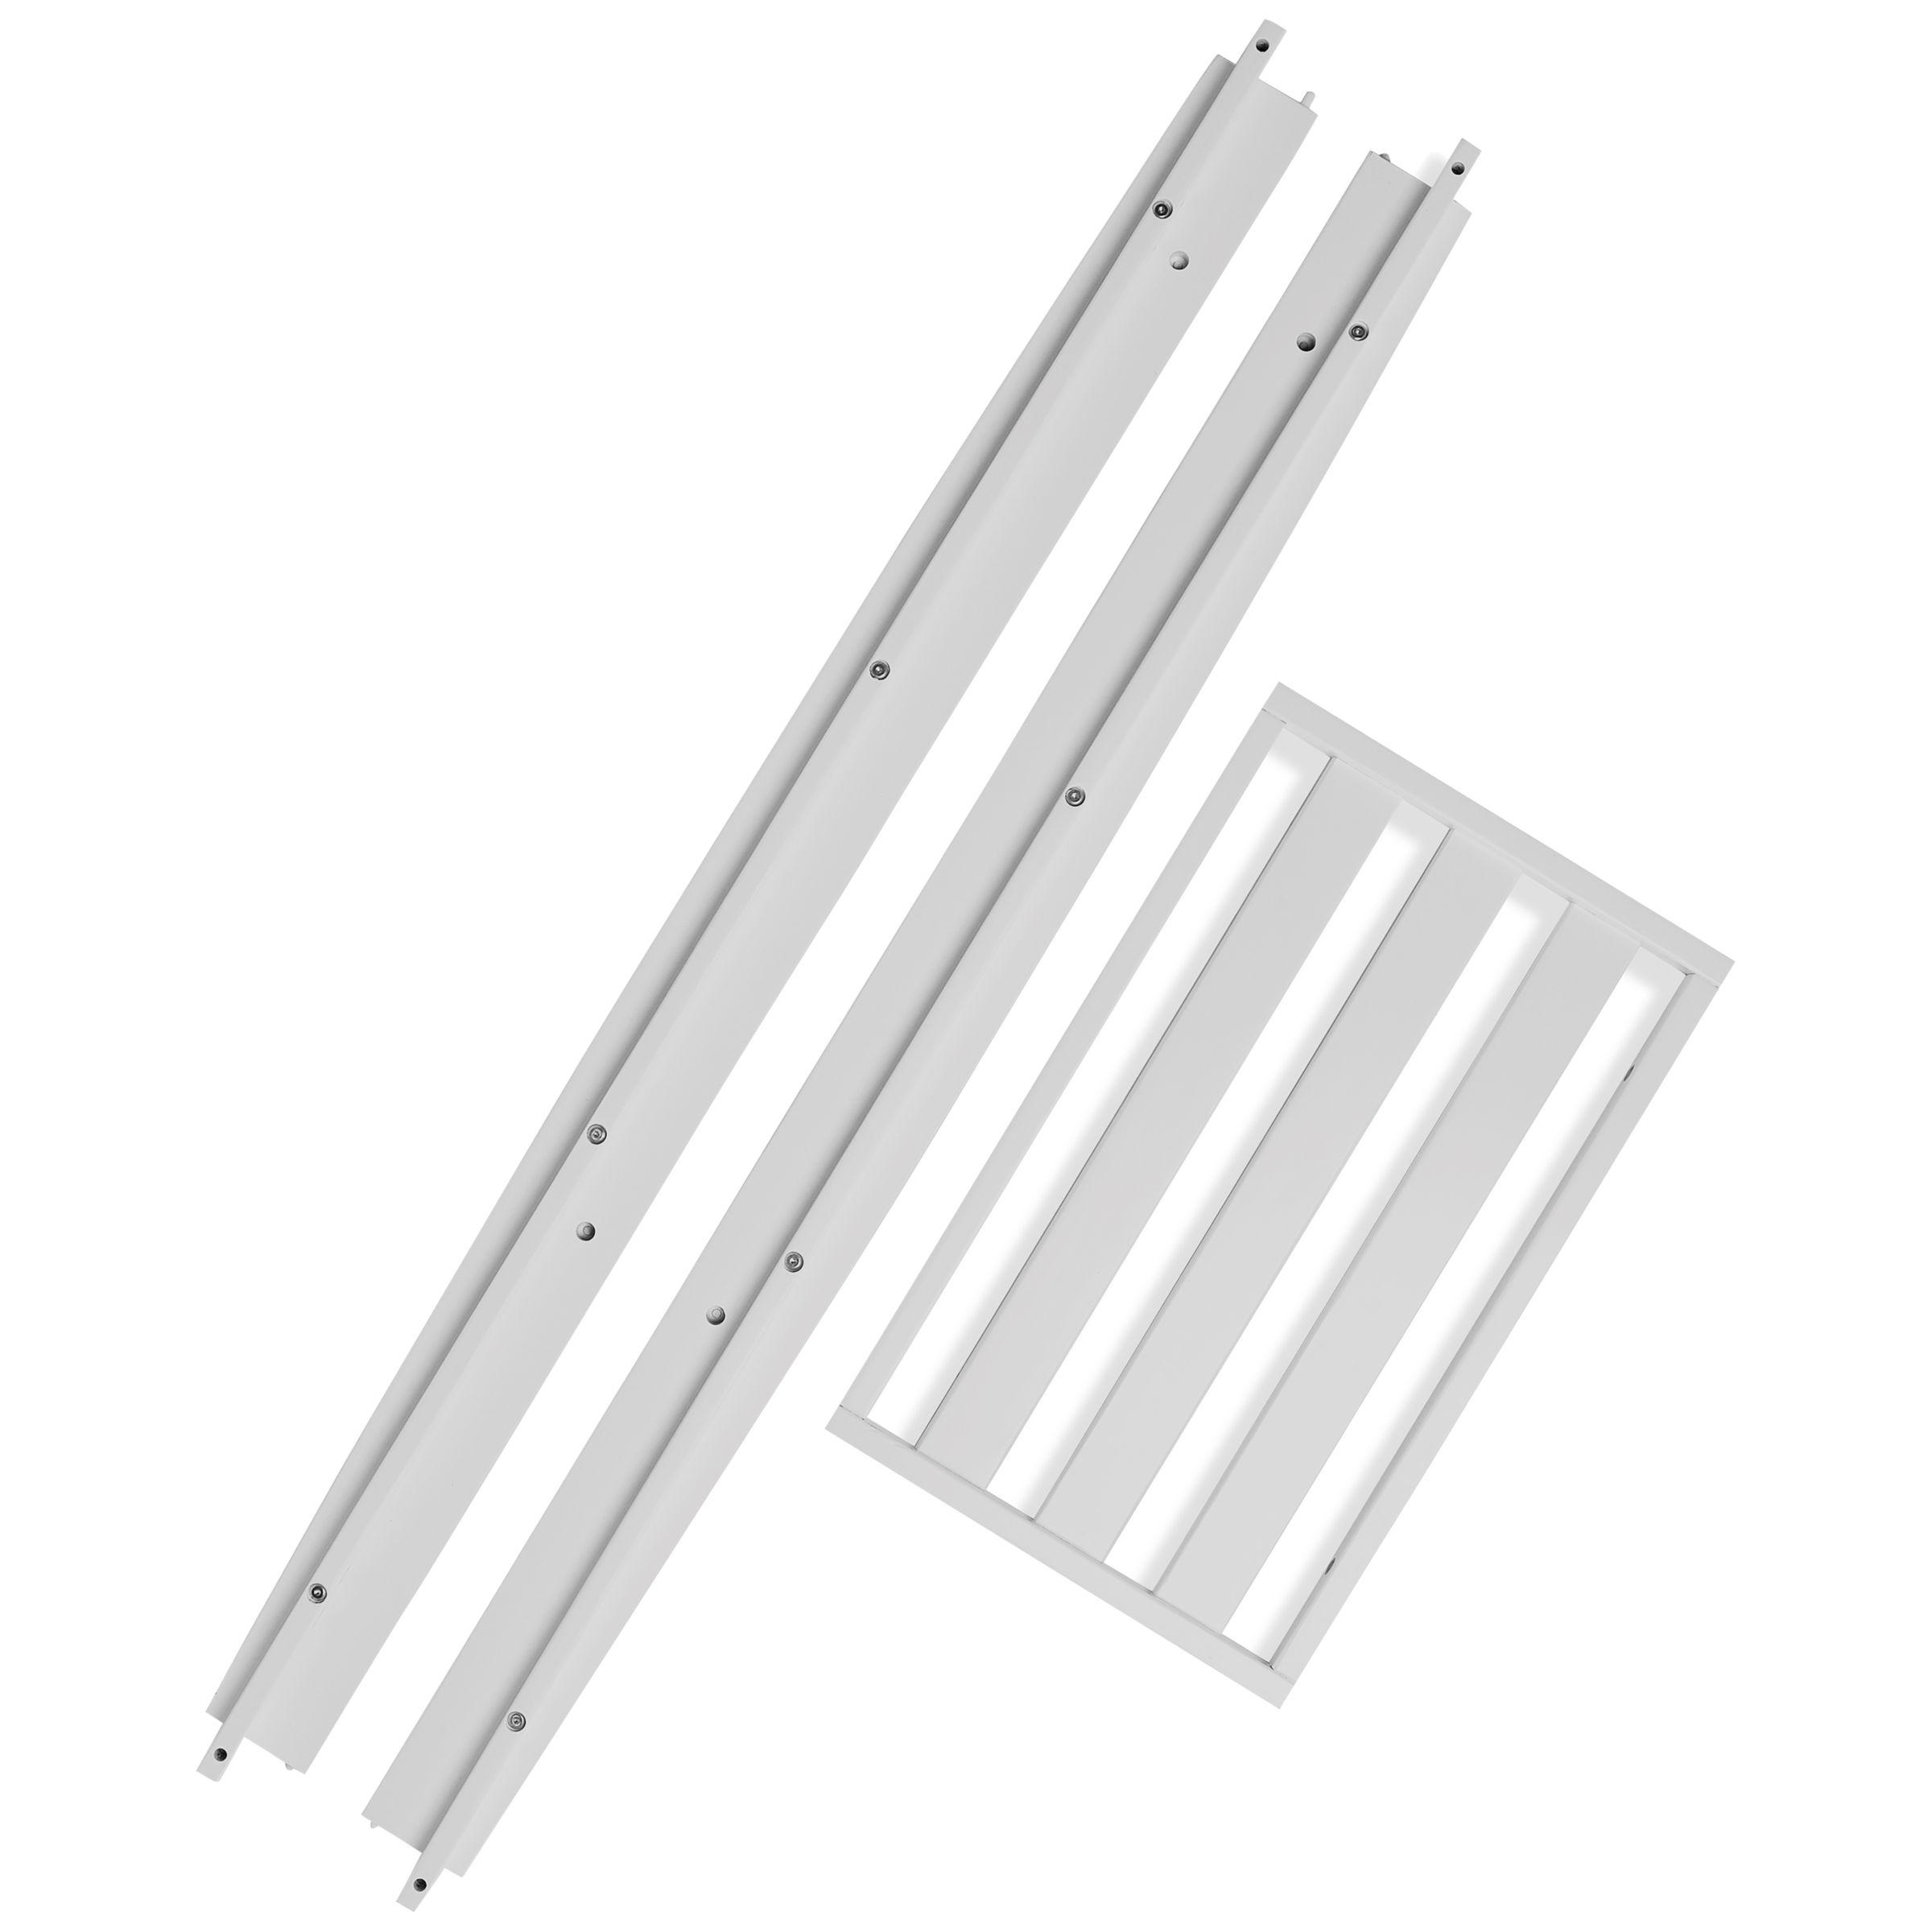 Snüz Snüzkot Junior Bed Extension Kit, Haze Grey